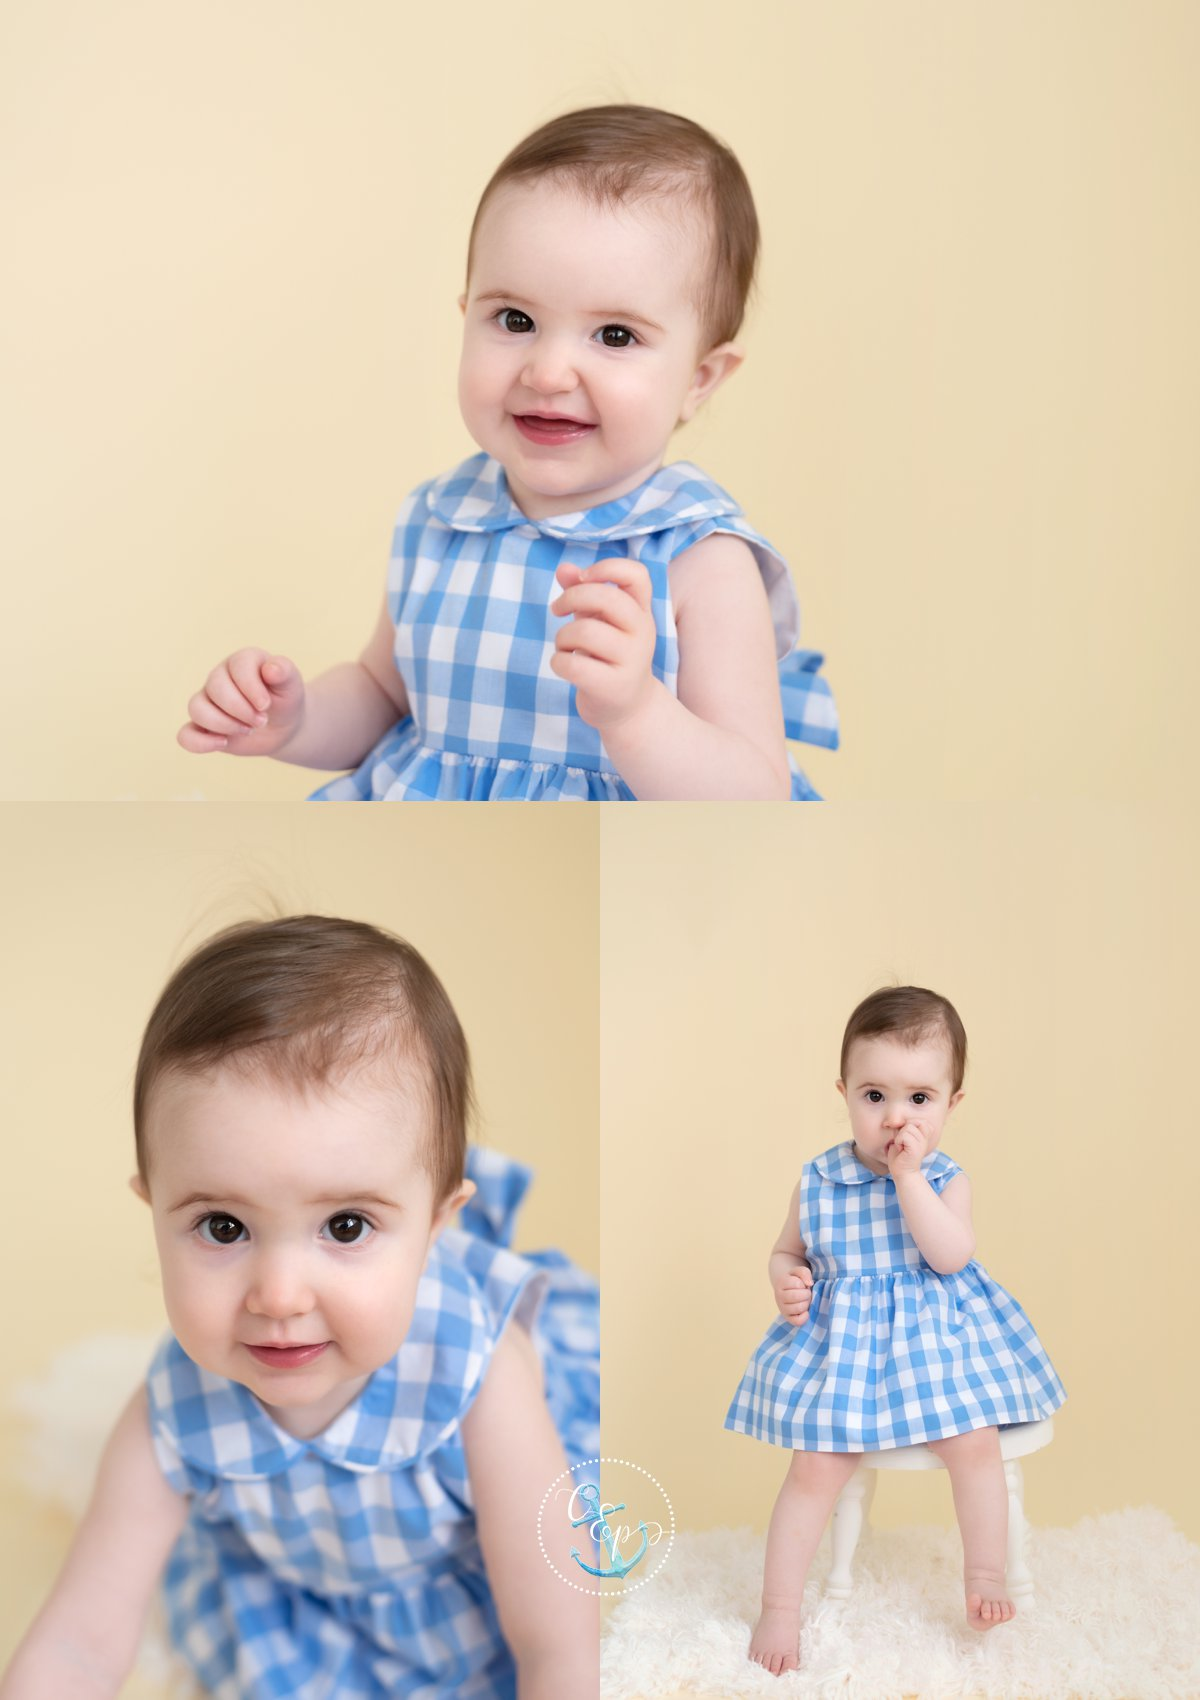 1 year old baby girl on cream background, natural light studio session Frederick MD, Copyright Cristina Elisa Photography LLC